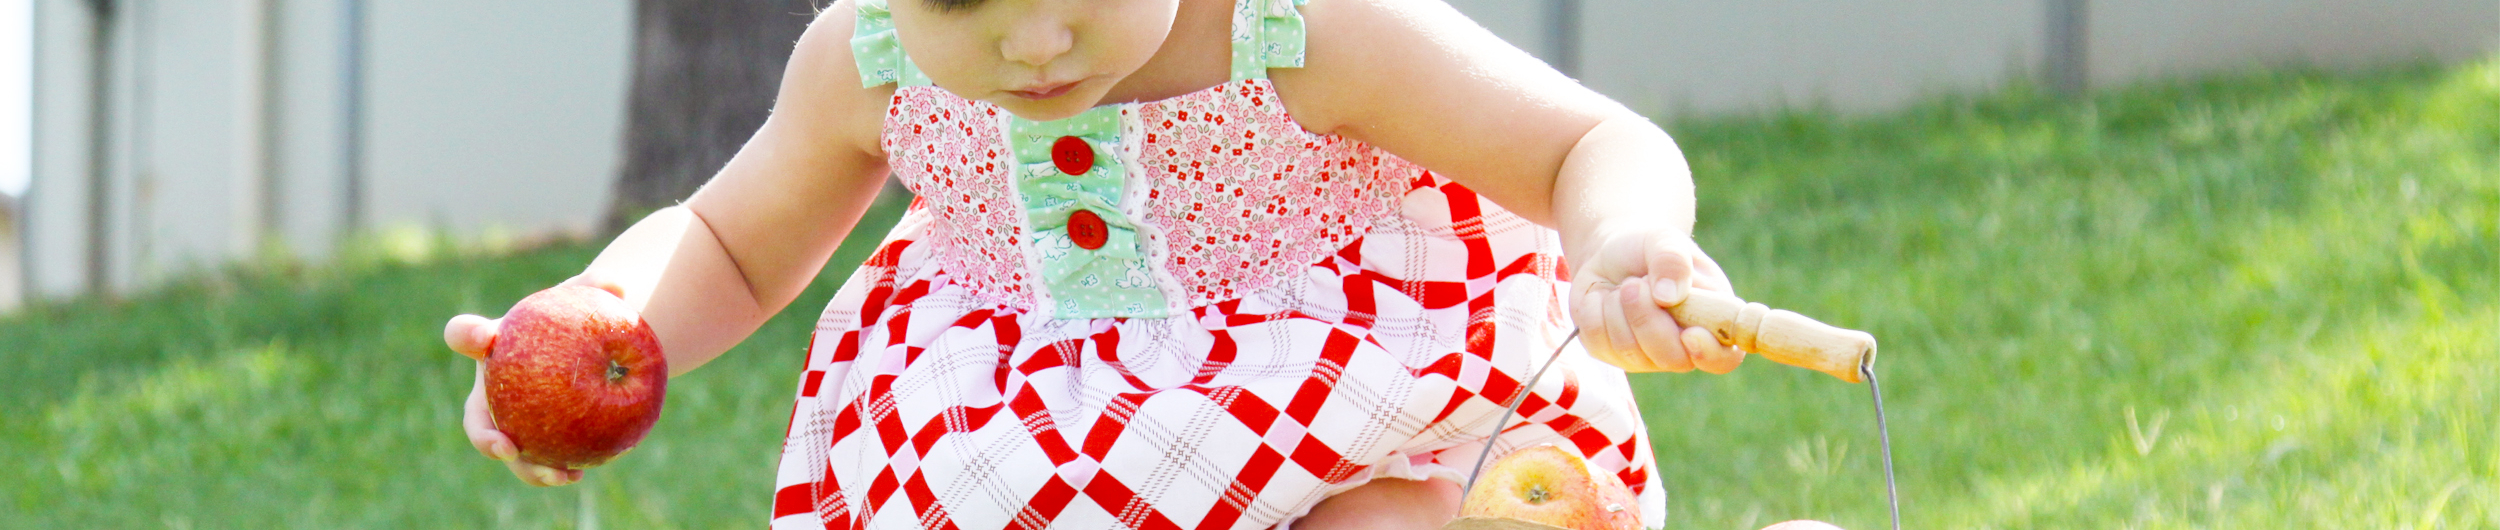 apple farm fabric by Elea Lutz